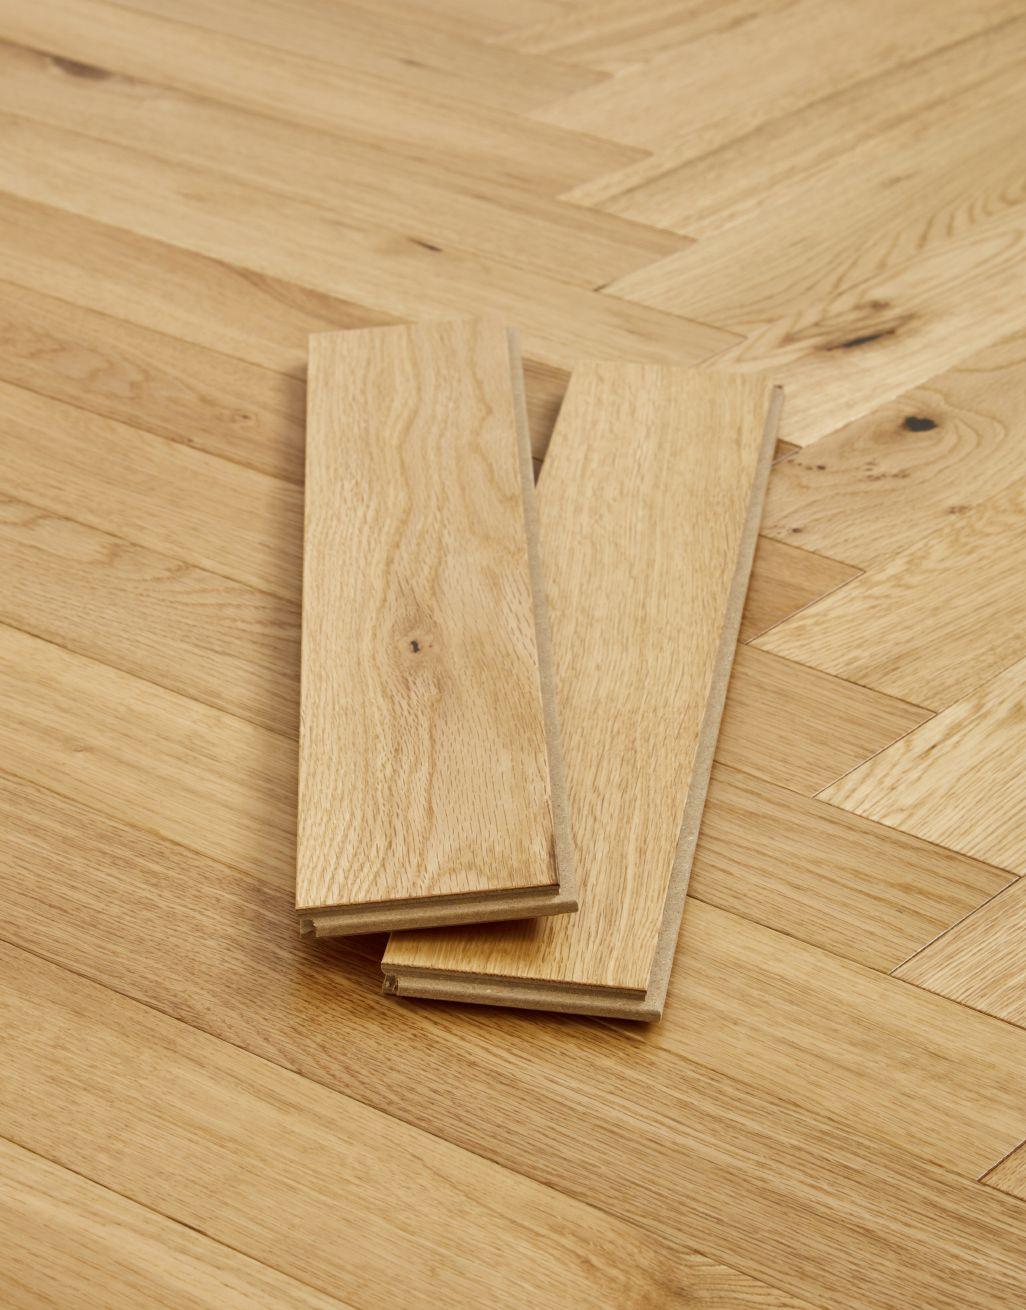 Village Herringbone Natural Oak, Project Source Natural Oak Laminate Flooring